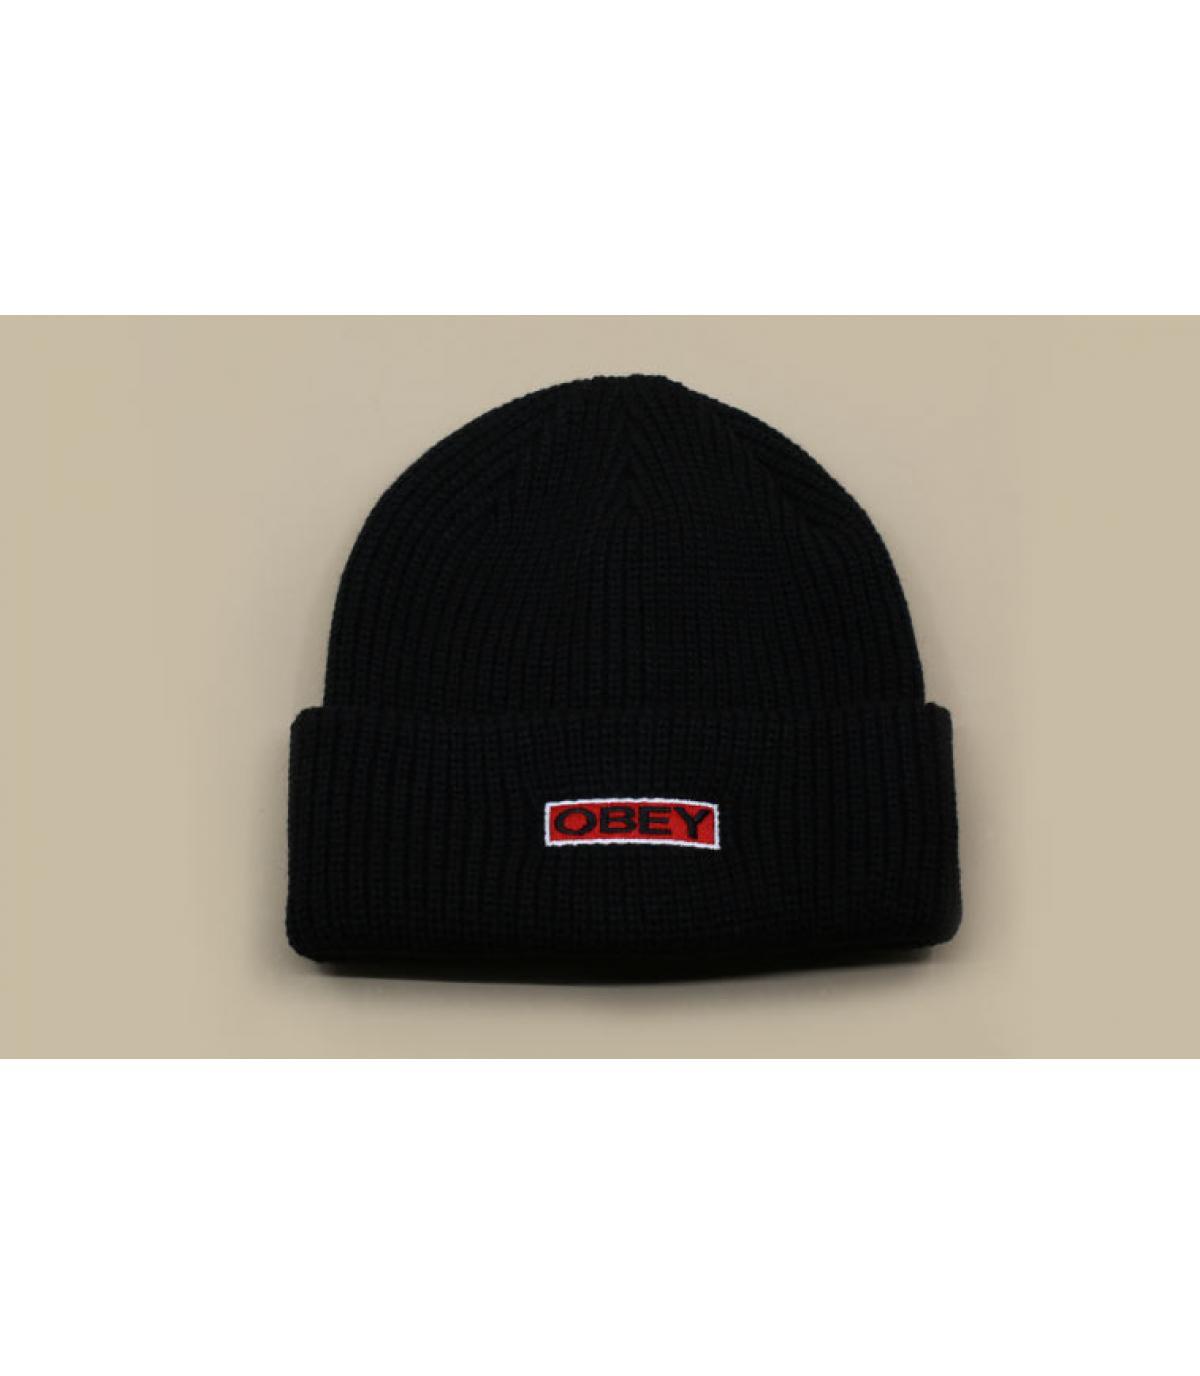 bonnet revers noir Obey